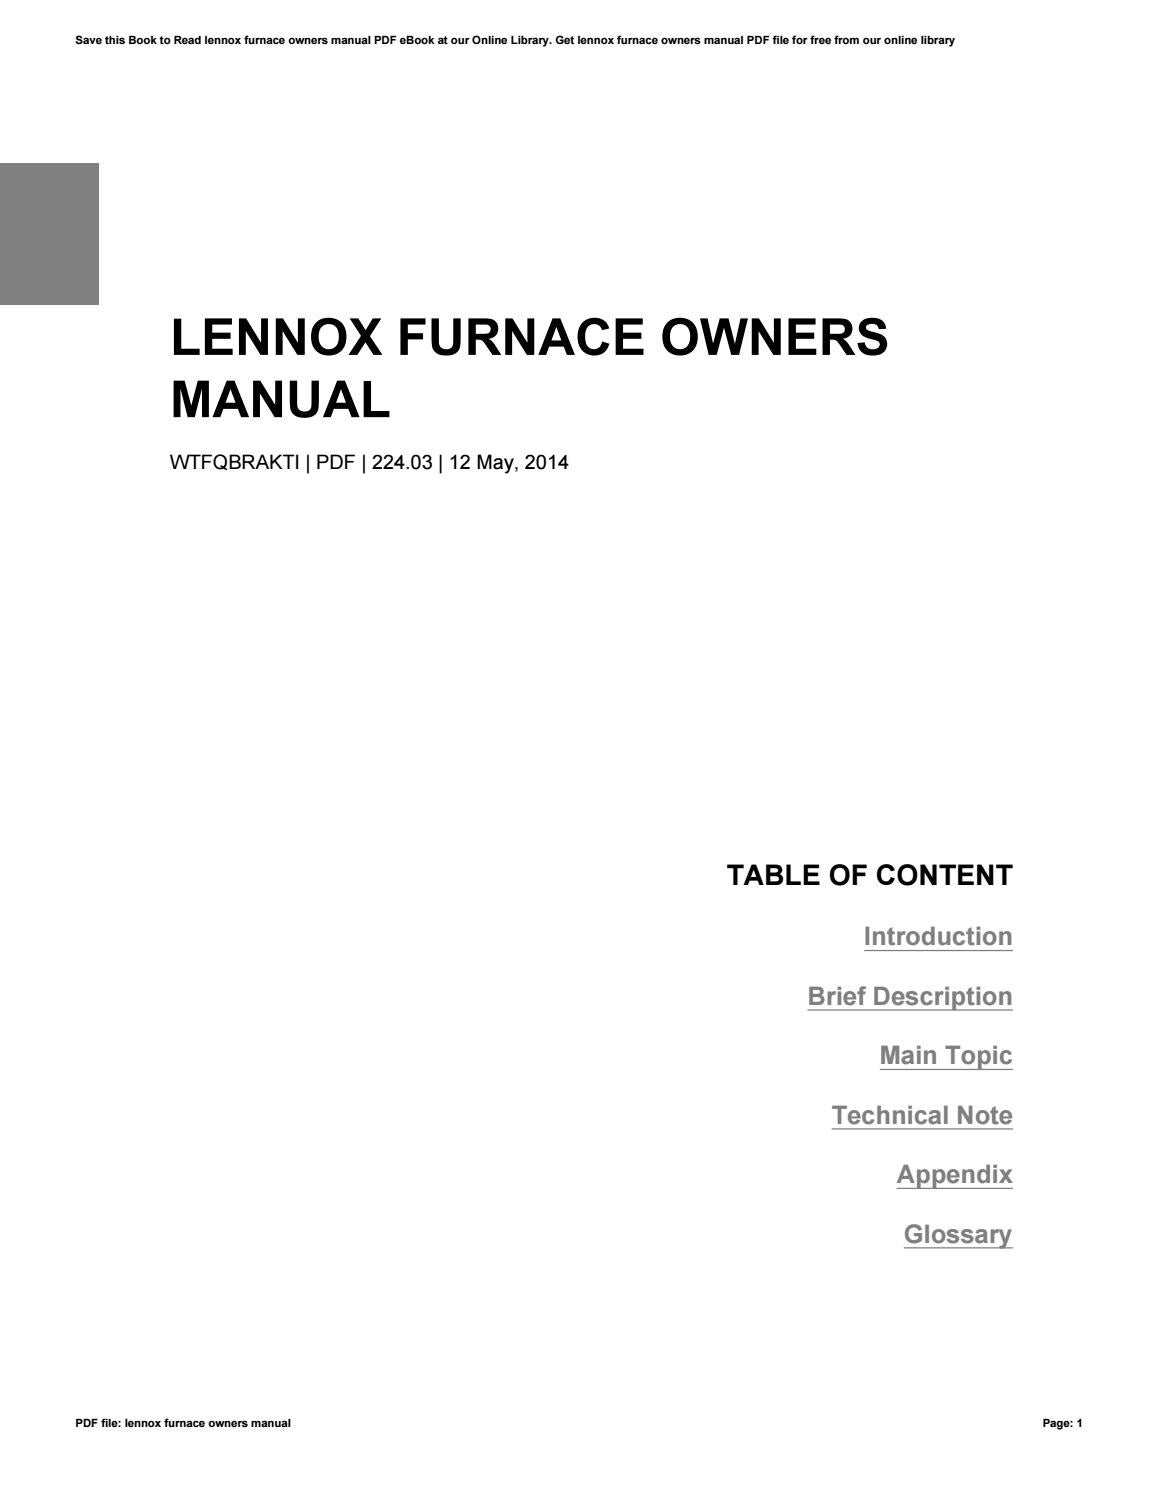 Lennox furnace Owners Manual